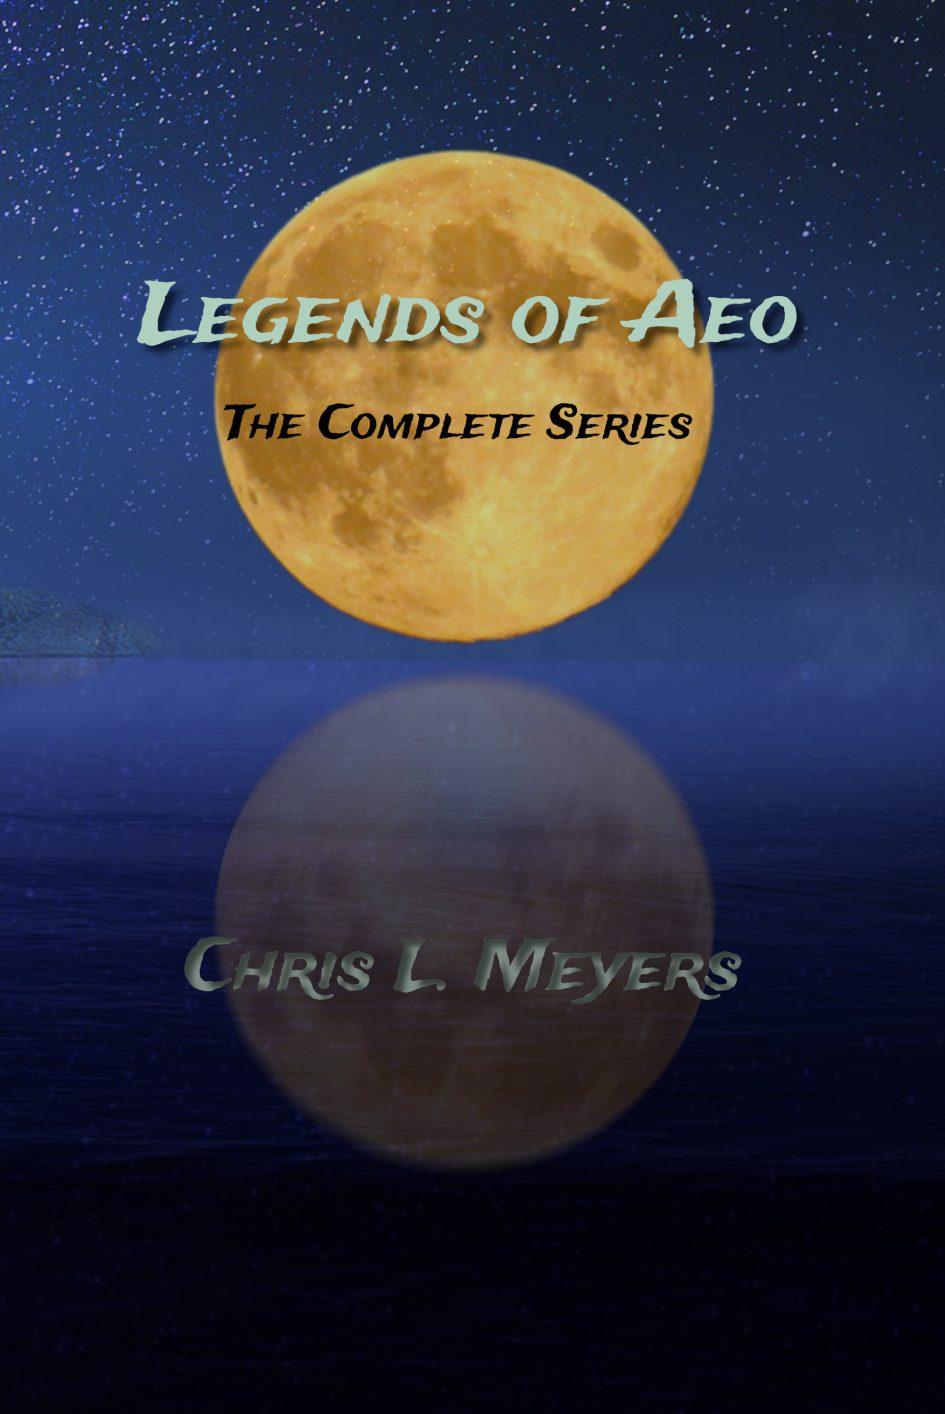 Legends of Aeo - orange moon over the sea